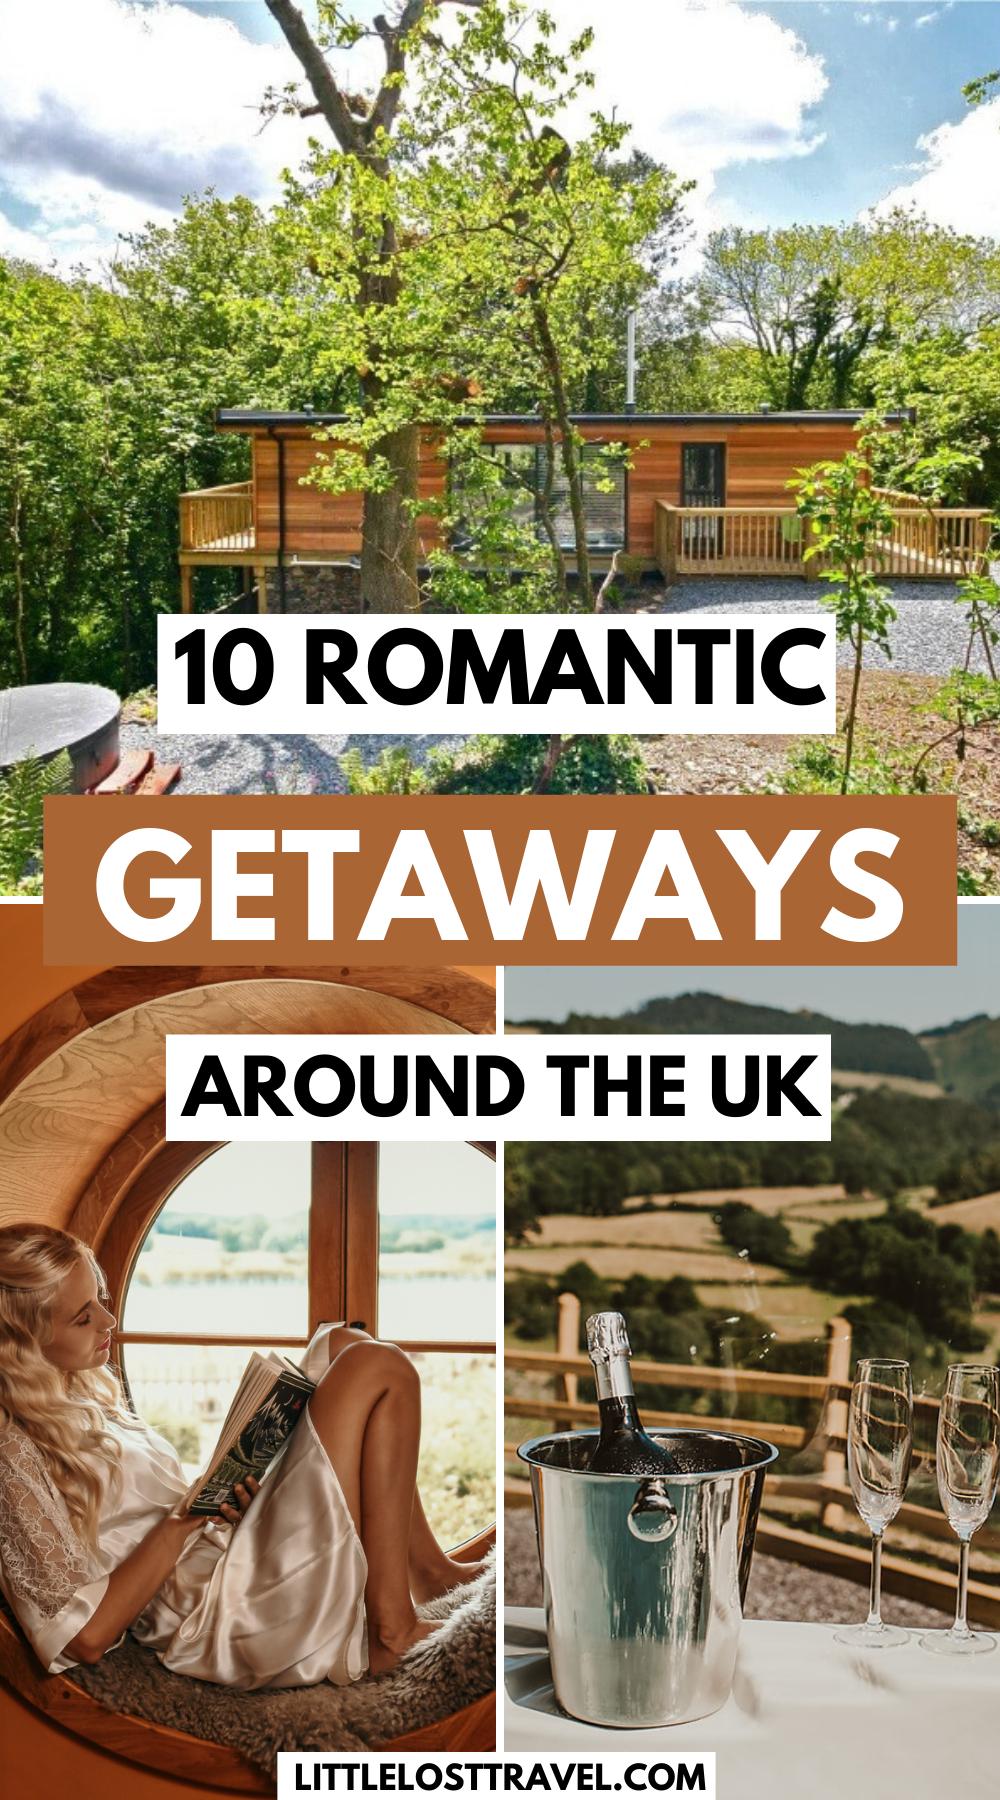 10 Romantic Secluded Getaways Around The Uk In 2021 Weekends Away Uk Lovers Getaway Secluded